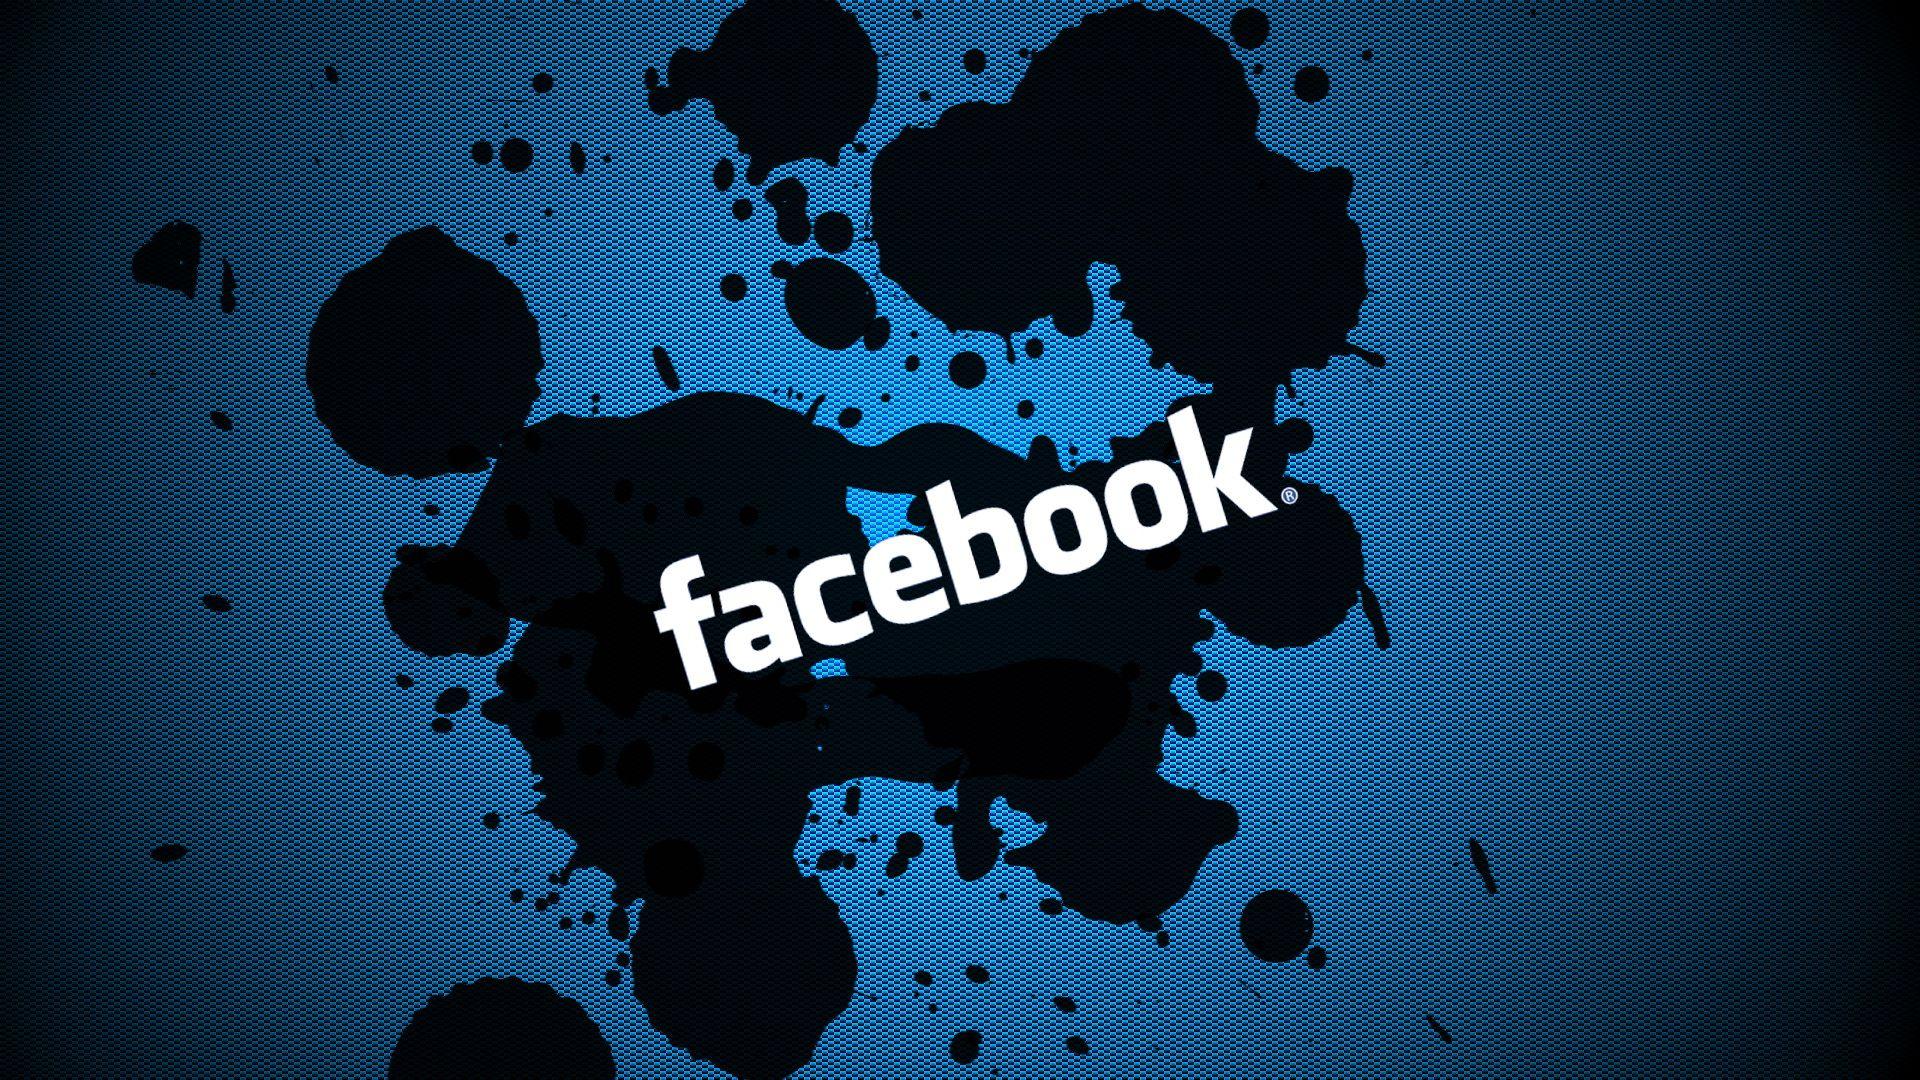 Facebook Wallpaper Hd Free Download New Hd Wallpapers Download